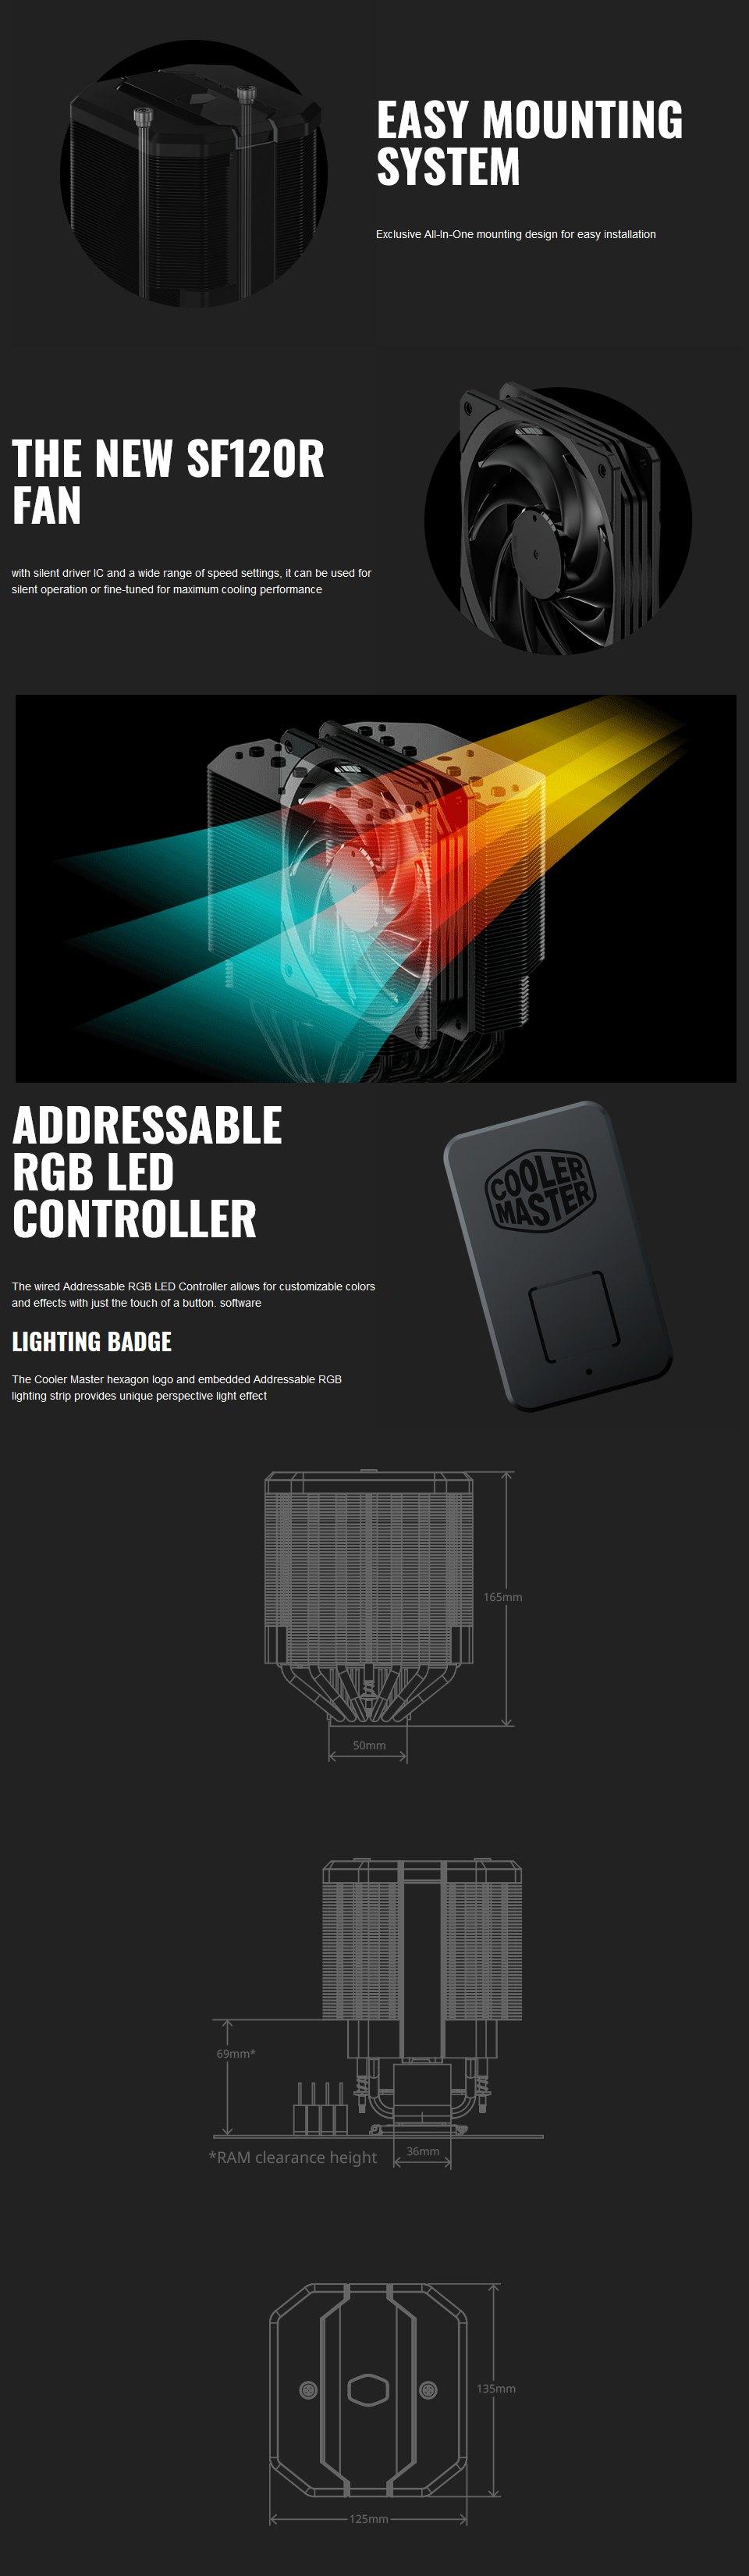 Cooler Master MasterAir MA620M Dual Tower ARGB CPU Cooler features 2